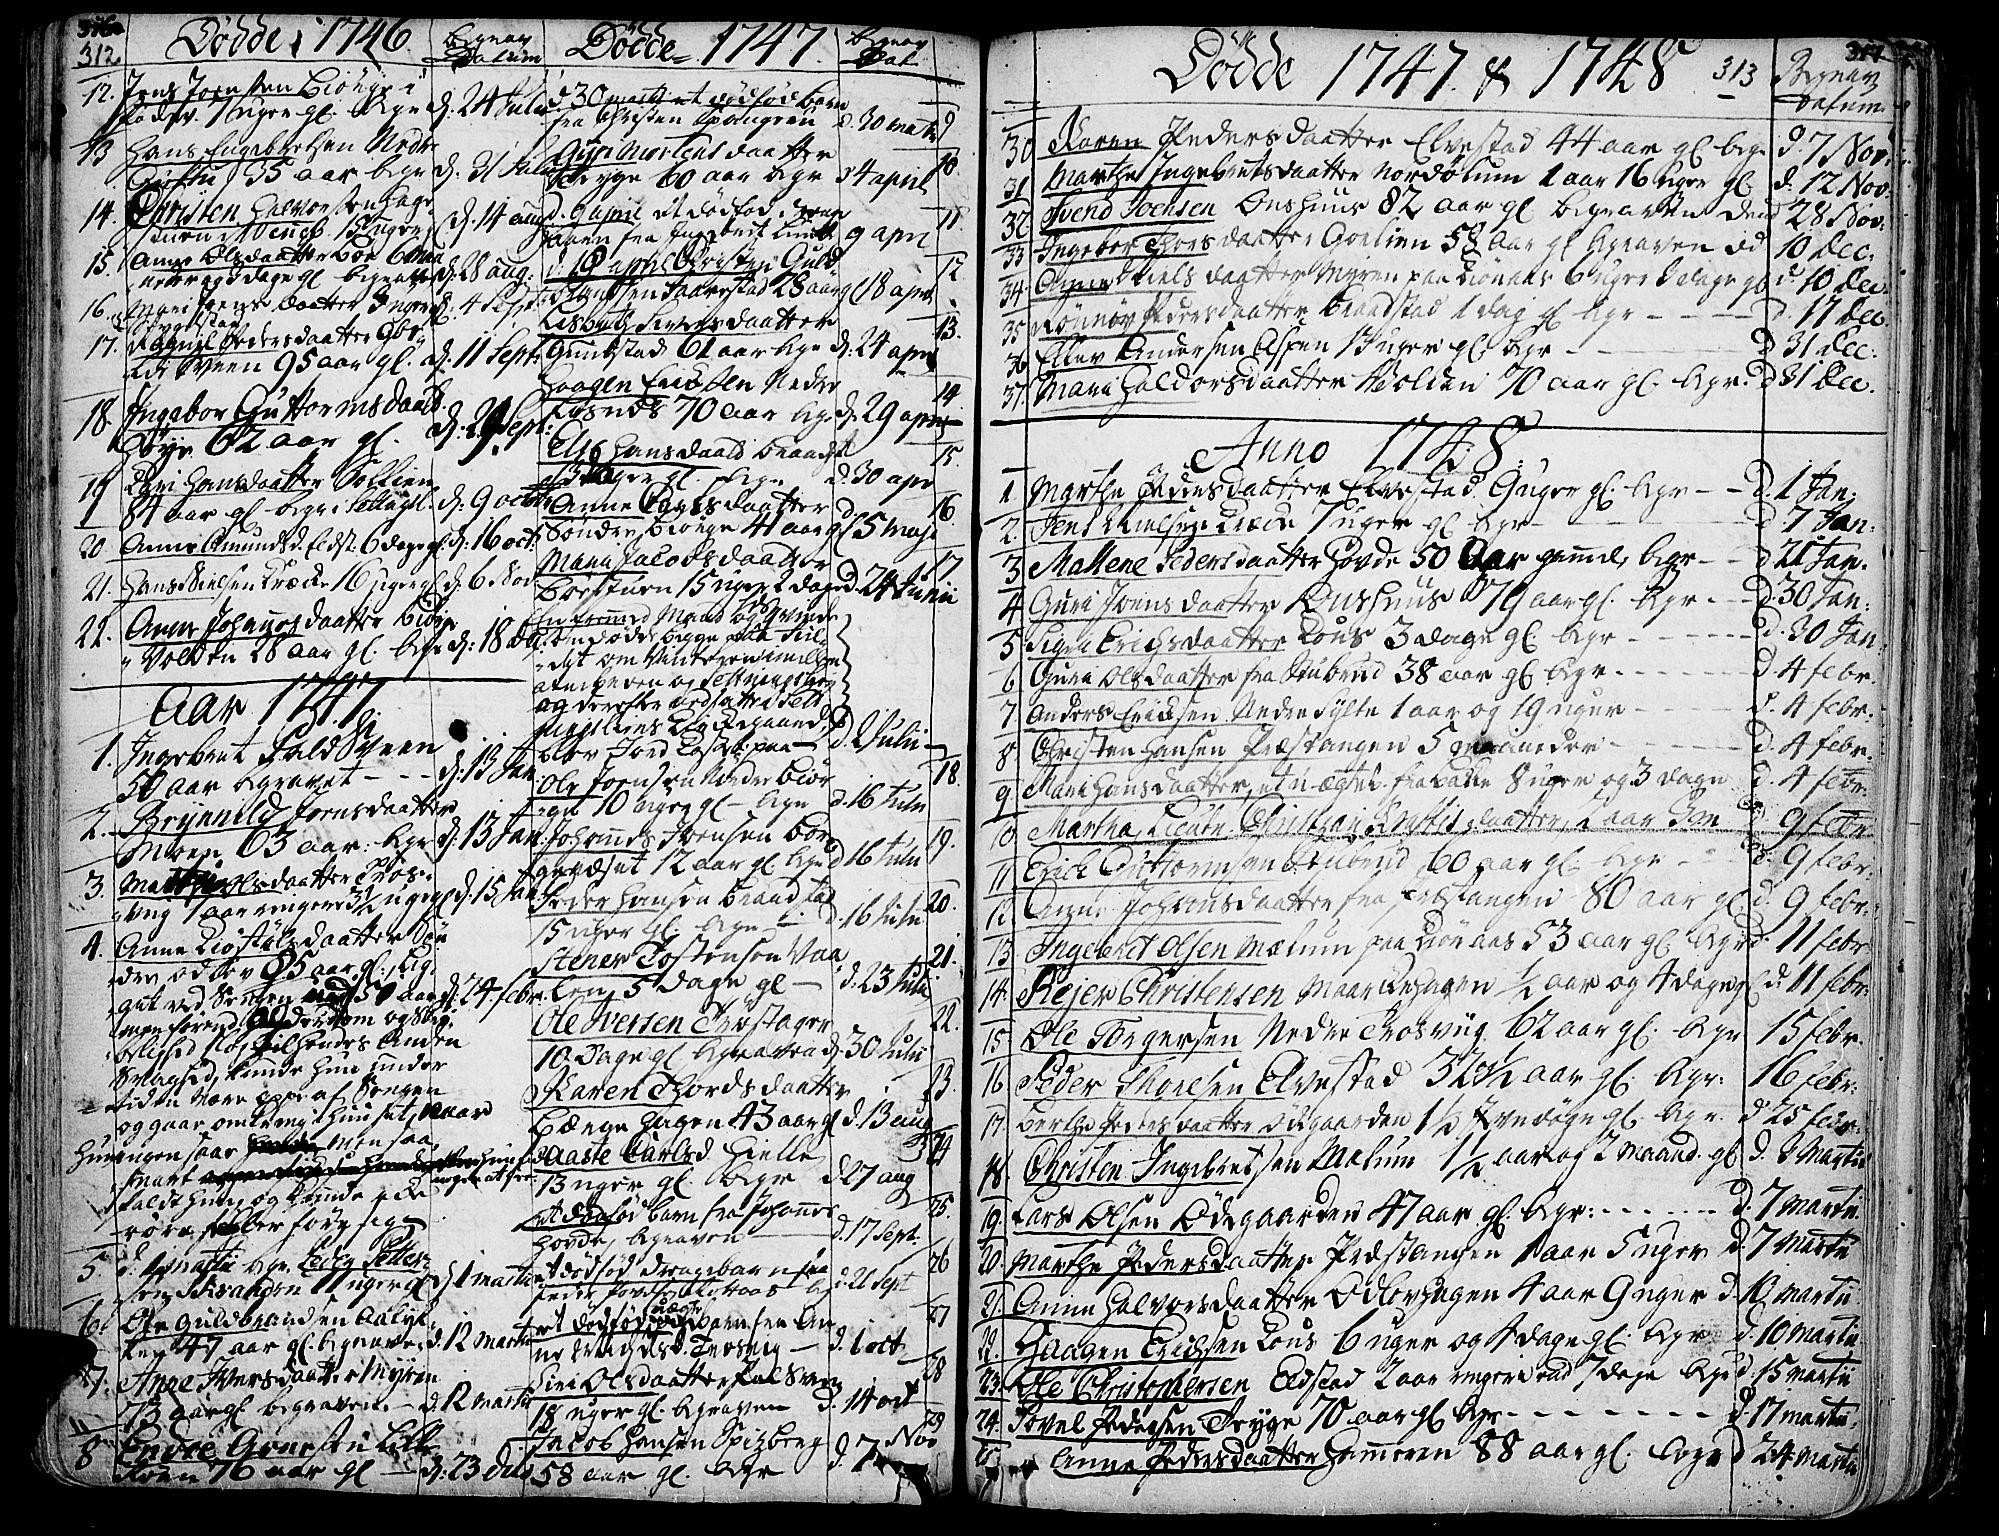 SAH, Ringebu prestekontor, Ministerialbok nr. 2, 1734-1780, s. 312-313